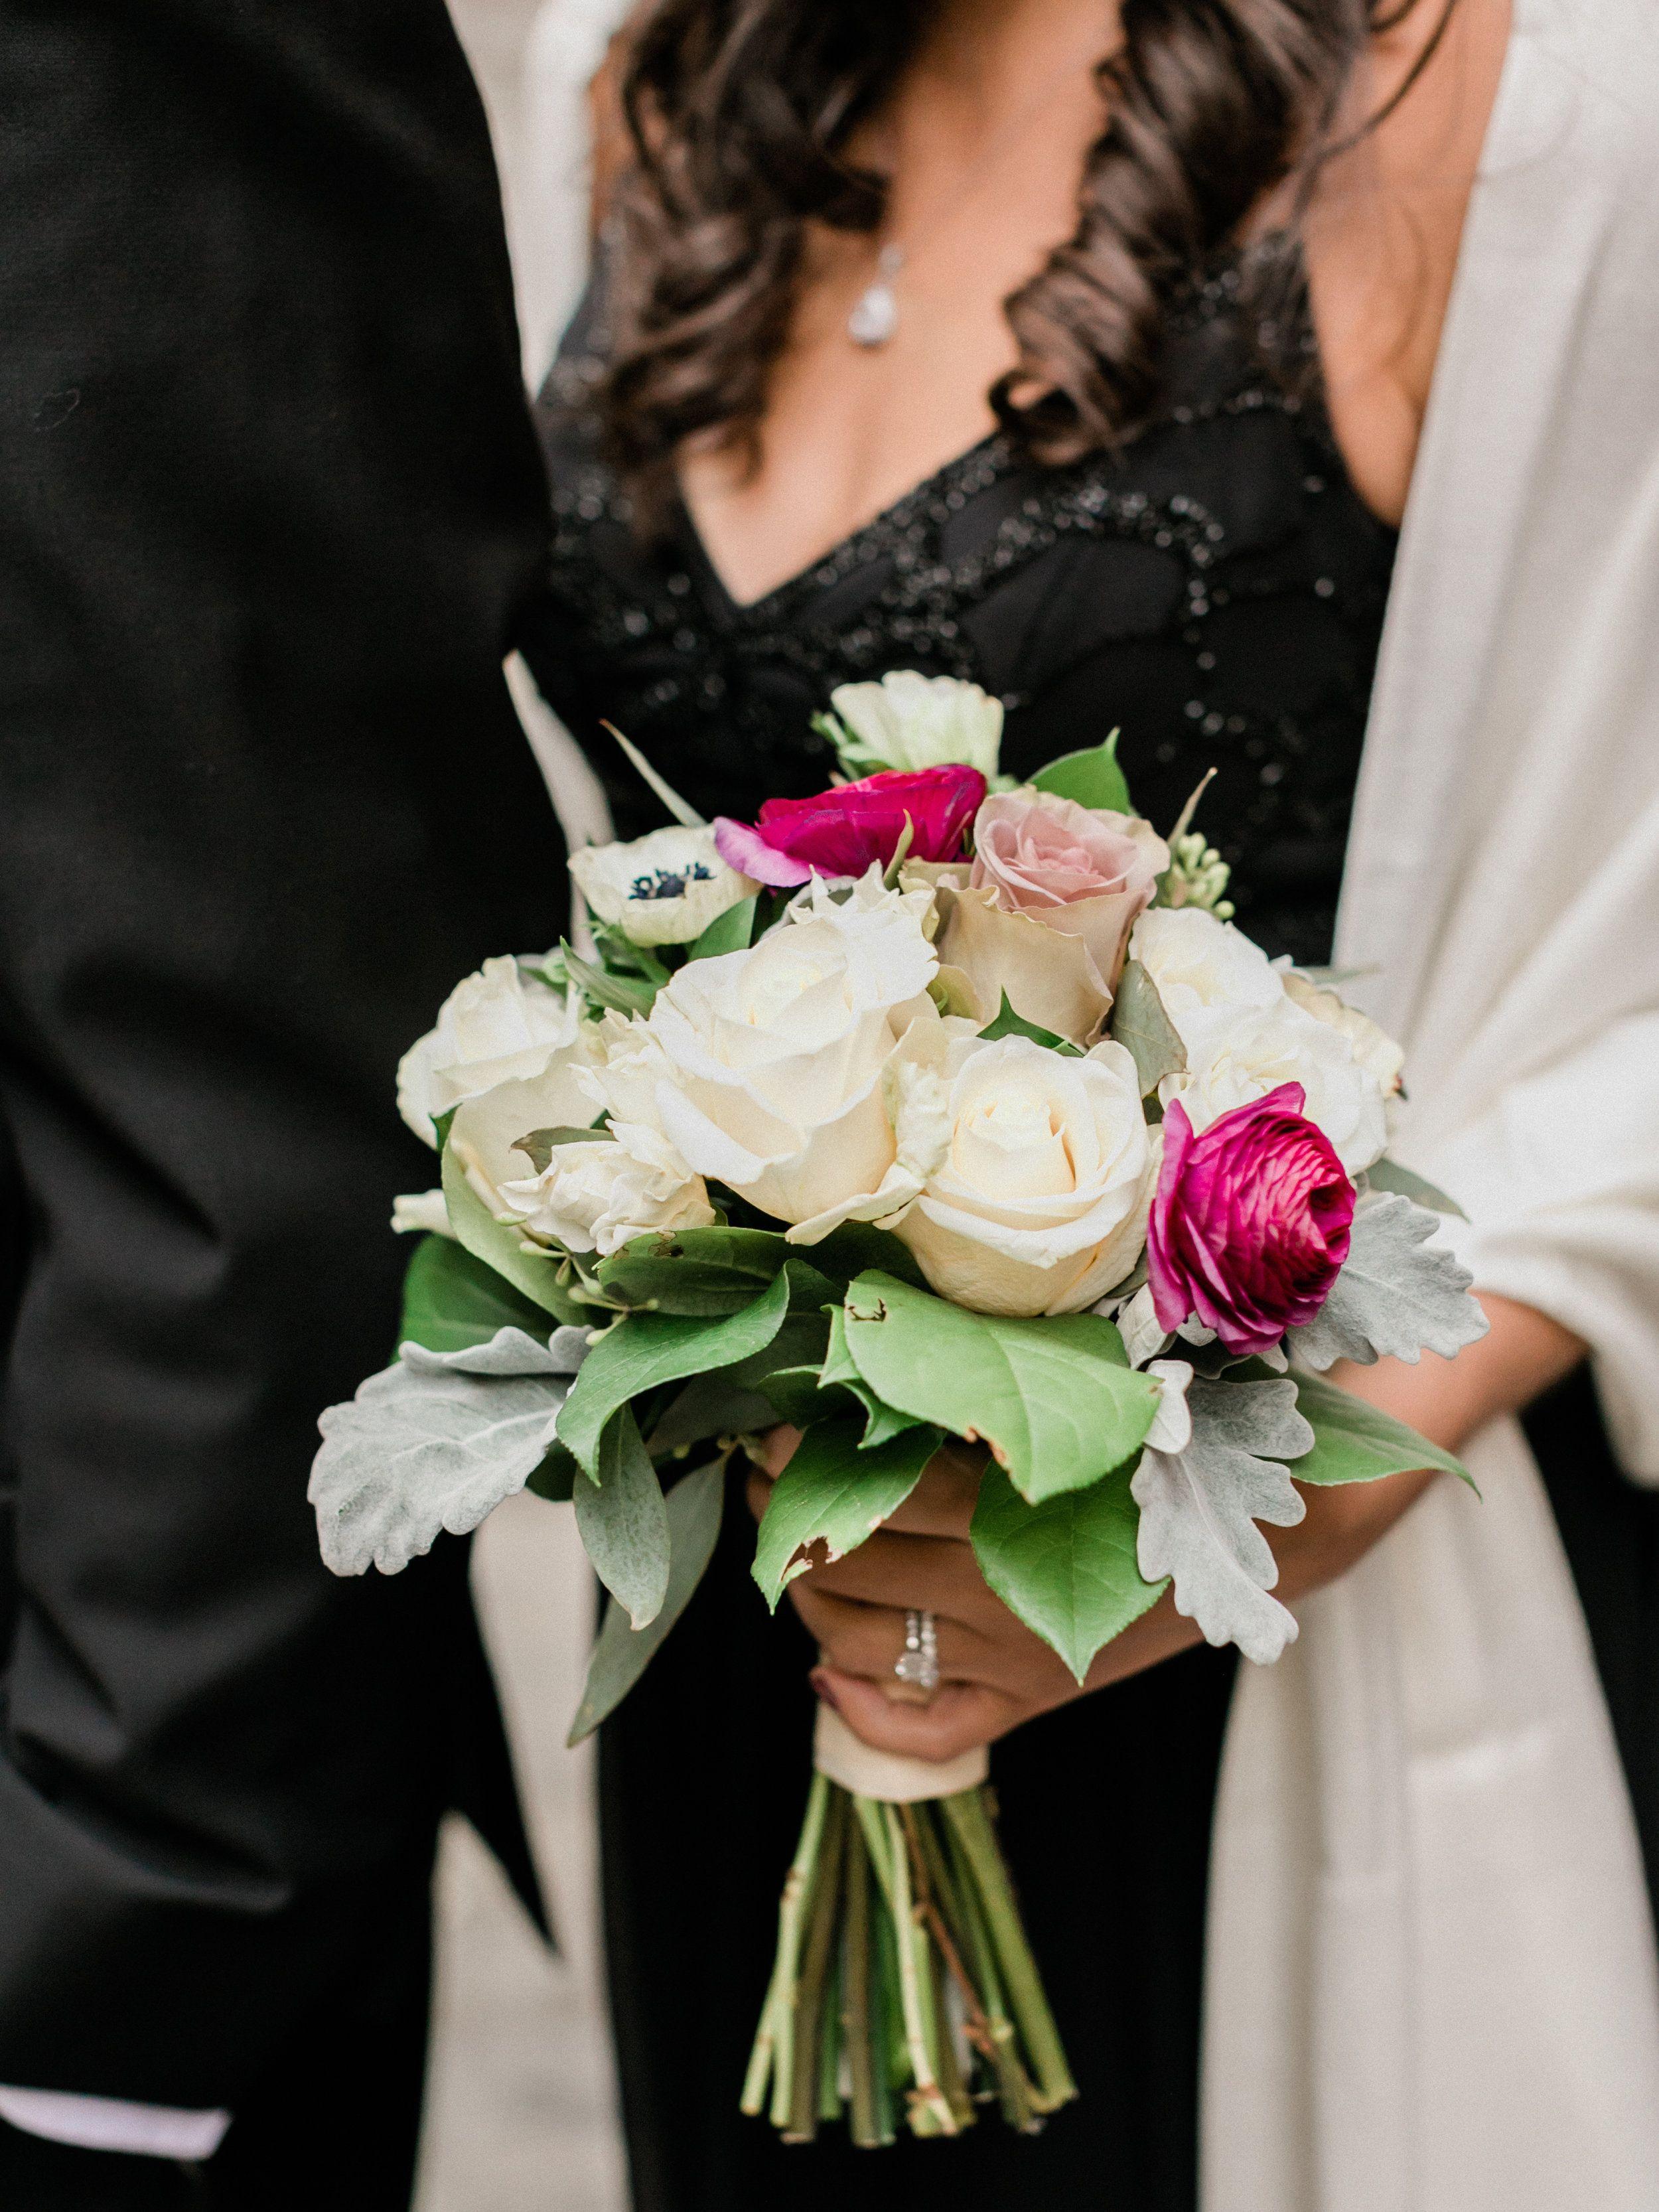 Modern Downtown New York City Wedding Chic New York City Weddings Nyc Wedding Wedding Flowe Wedding Decision Wedding Flower Inspiration White Wedding Flowers